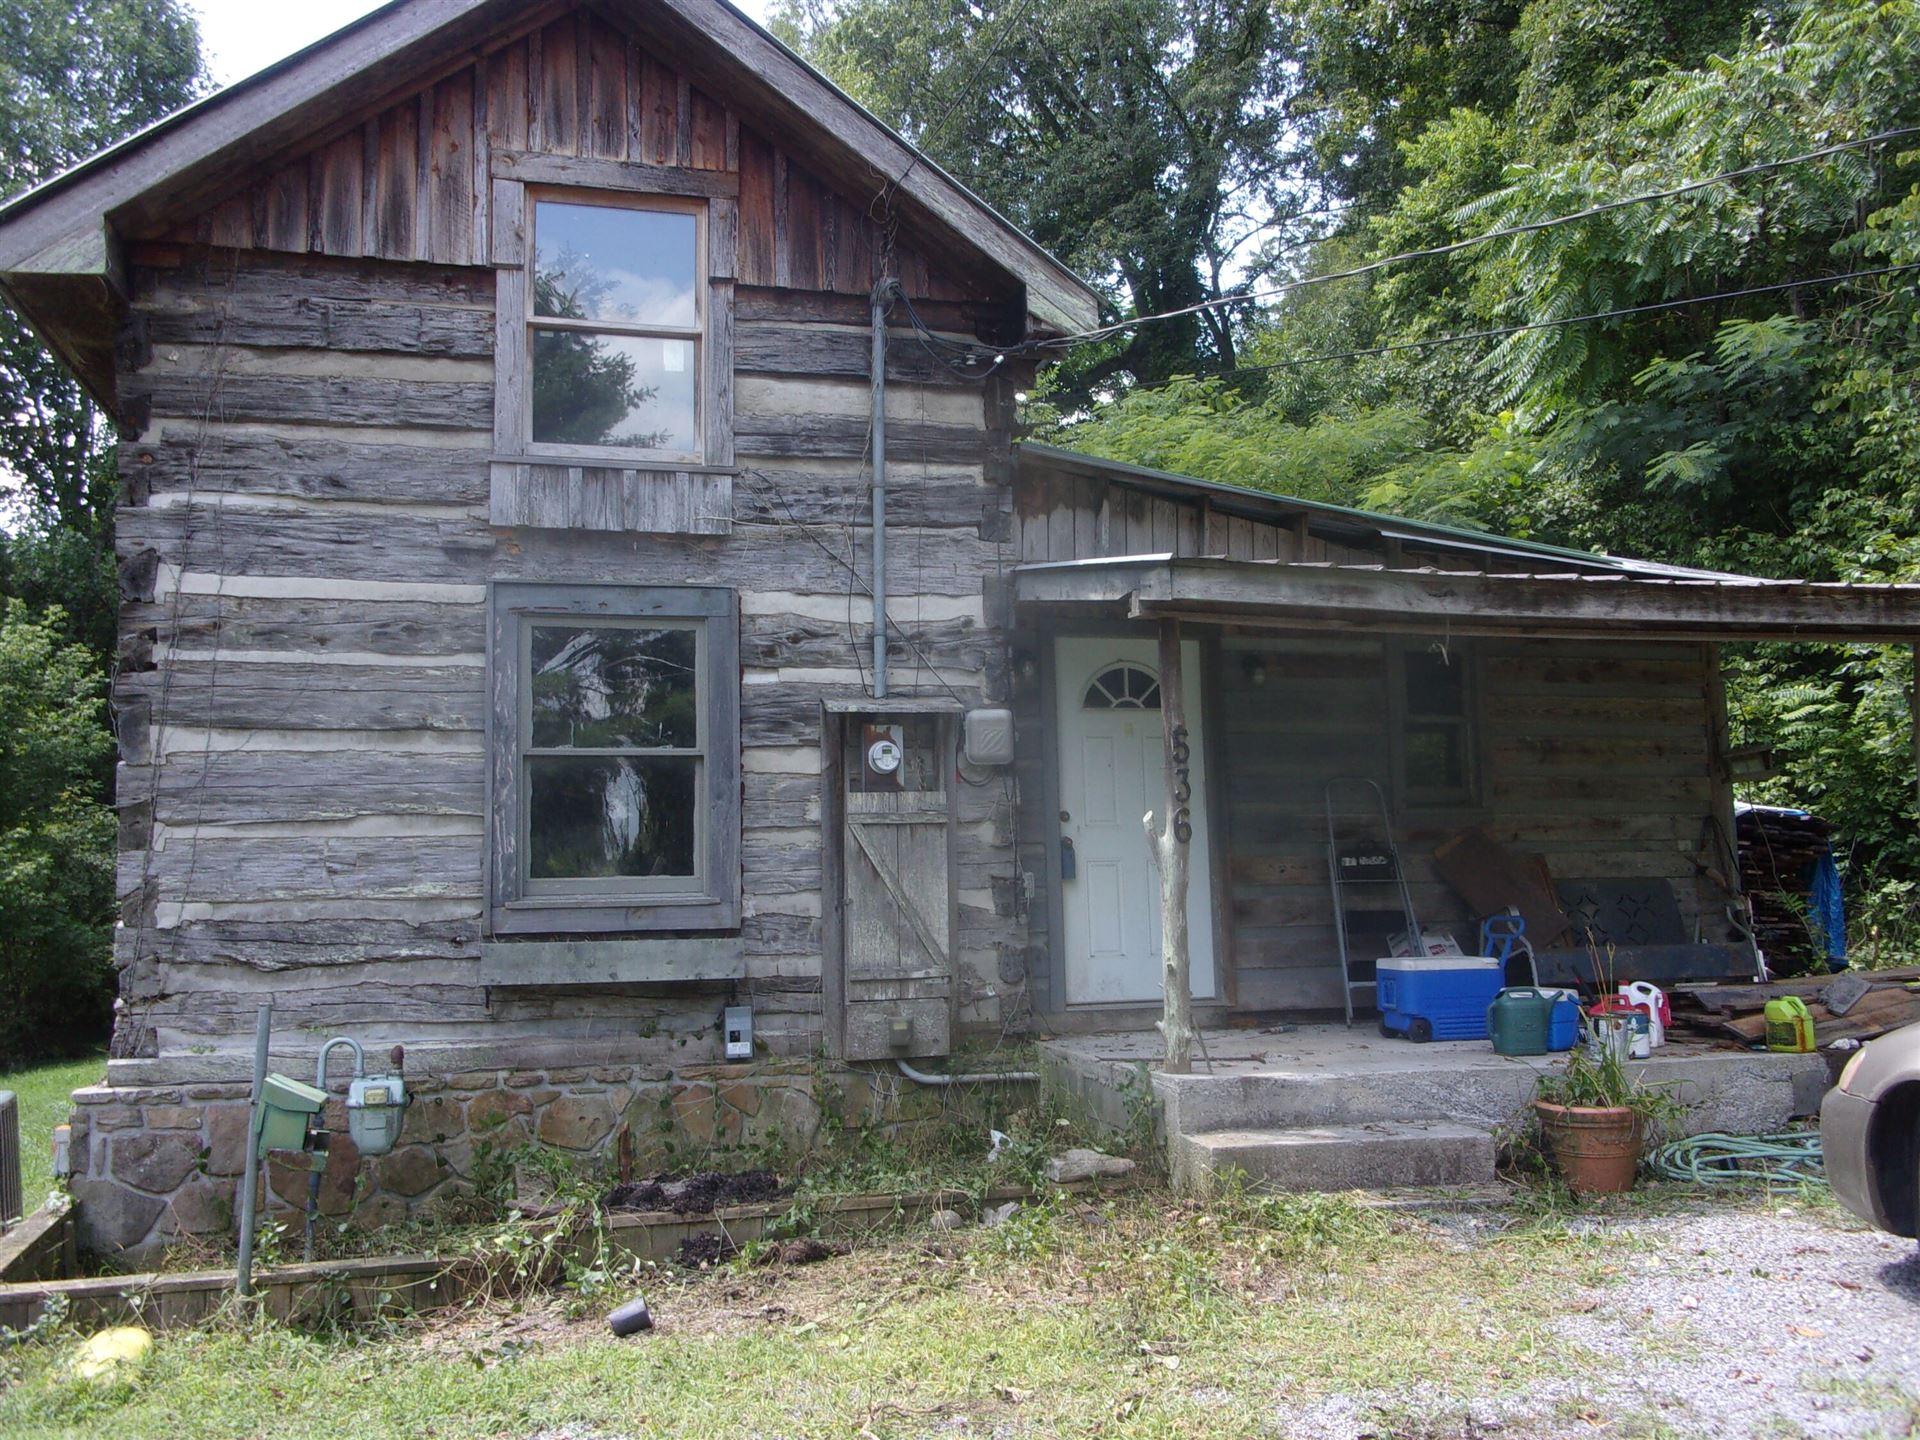 Photo of 536 Sinking Springs Rd, Clinton, TN 37716 (MLS # 1163455)